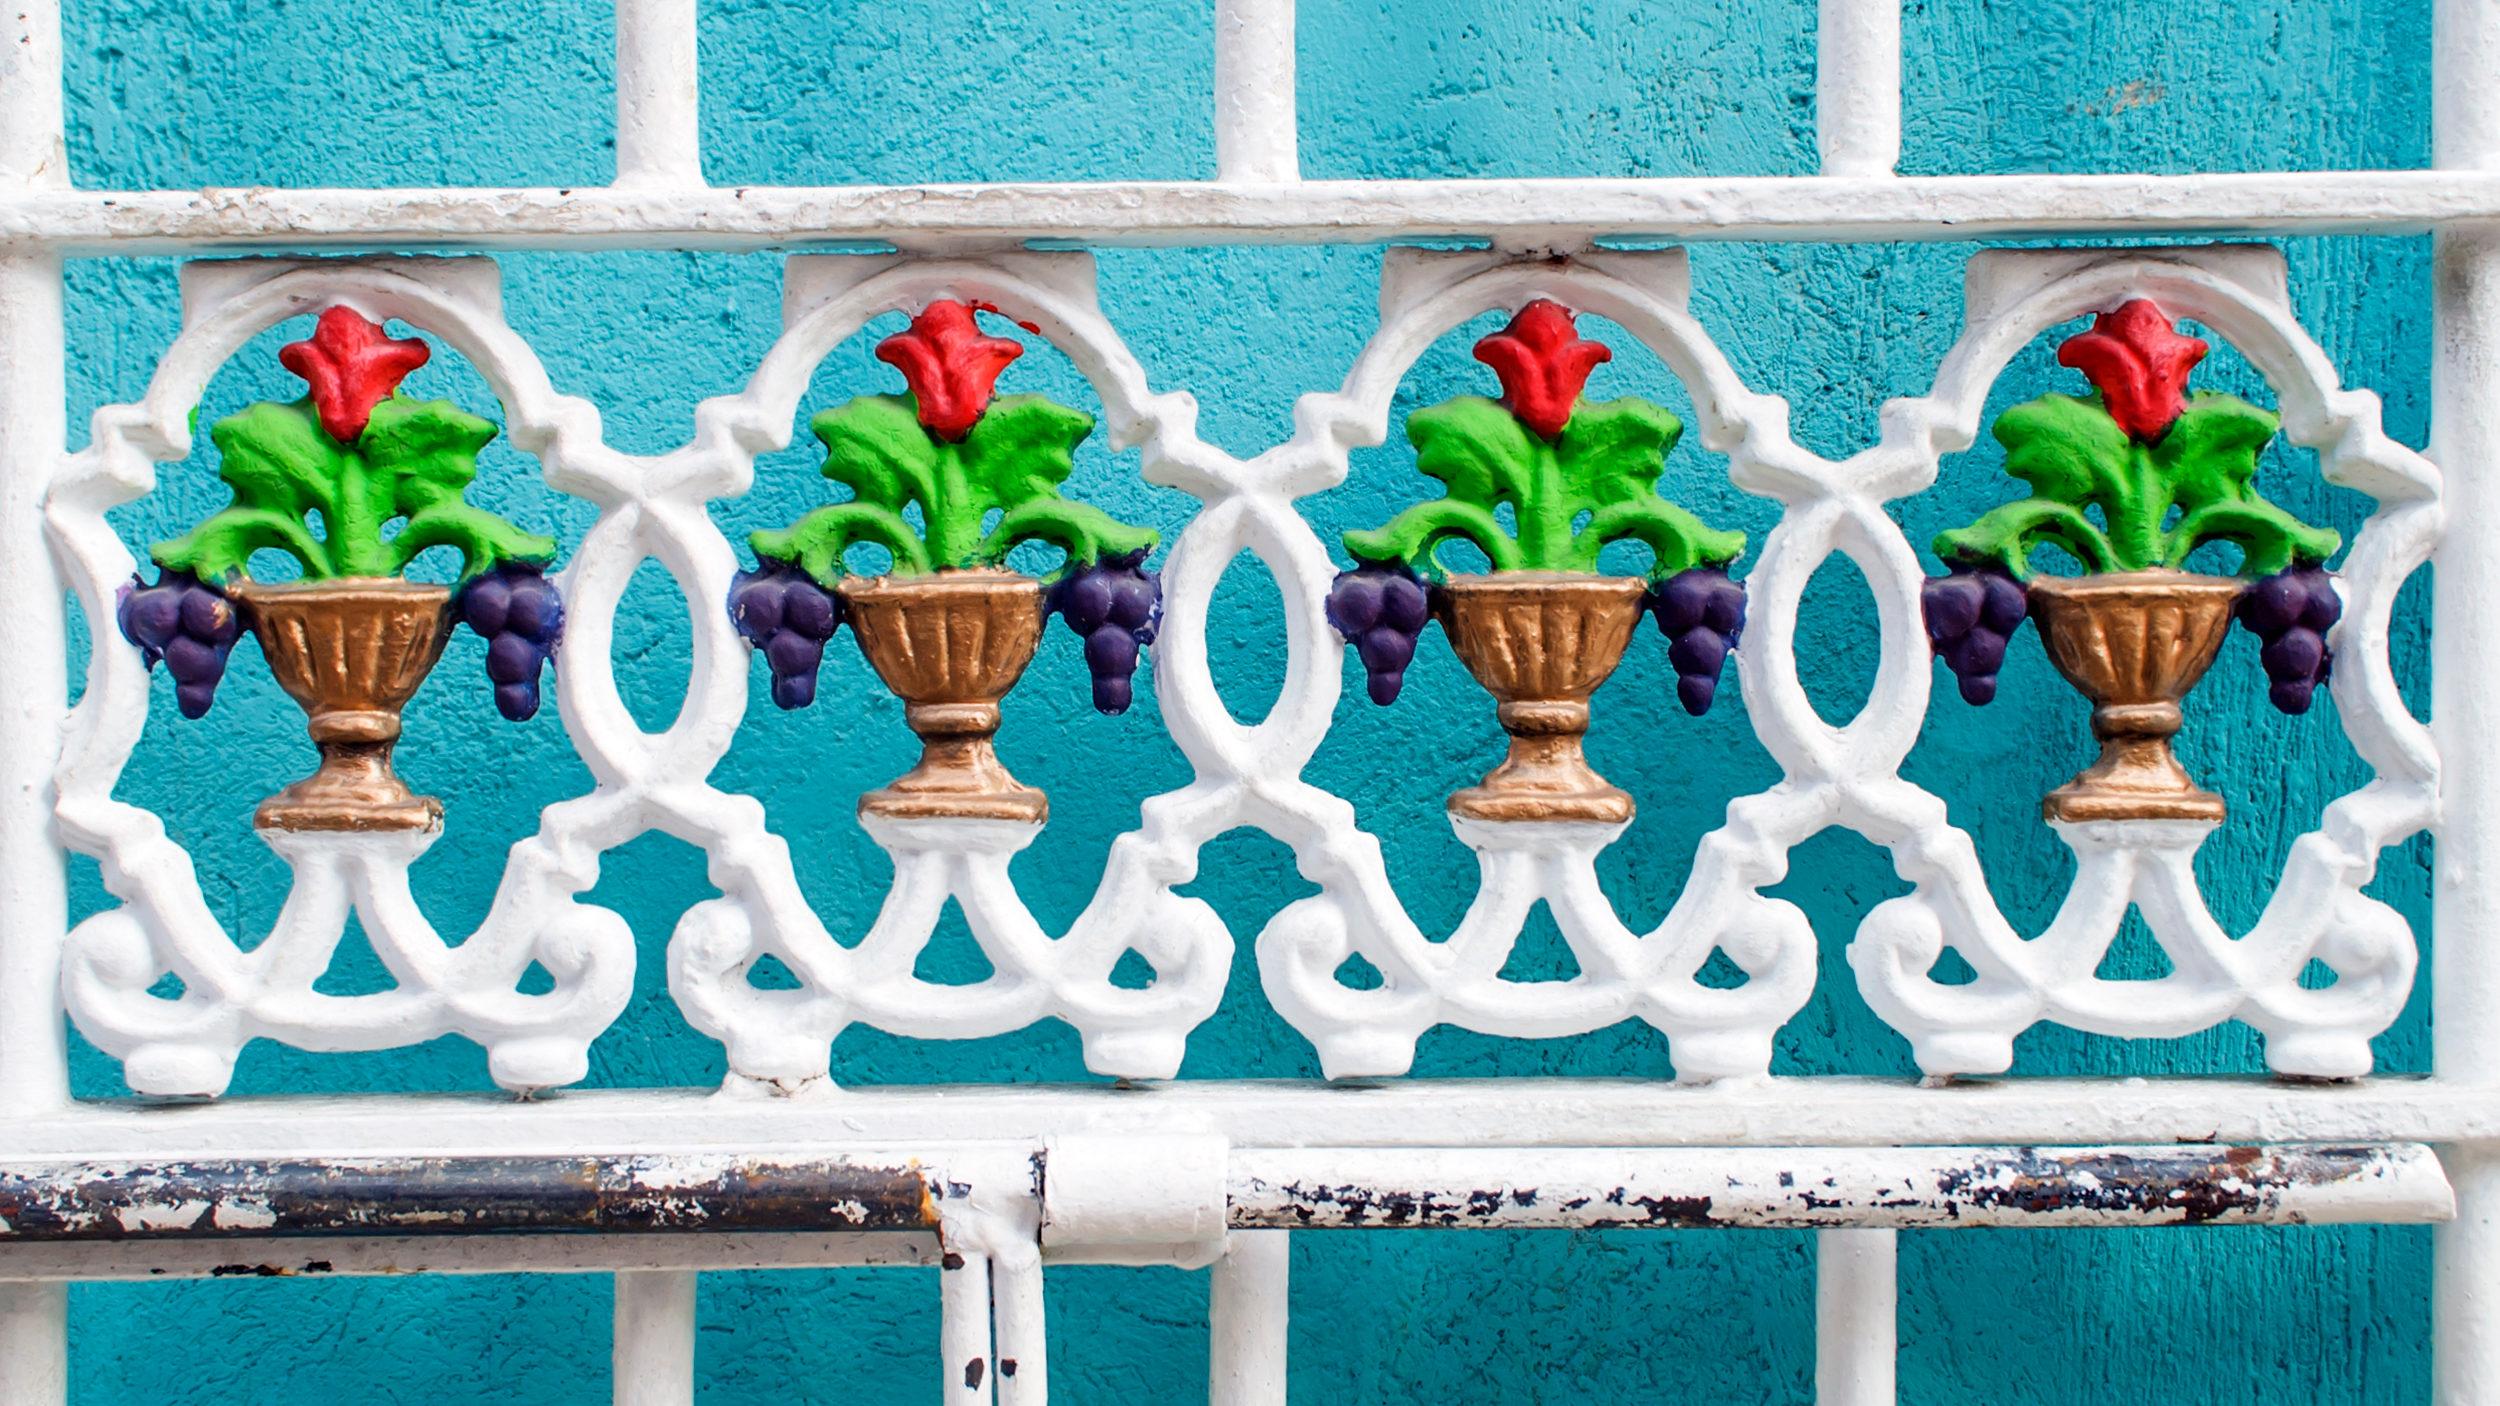 Dominican Republic [Shutterstock]